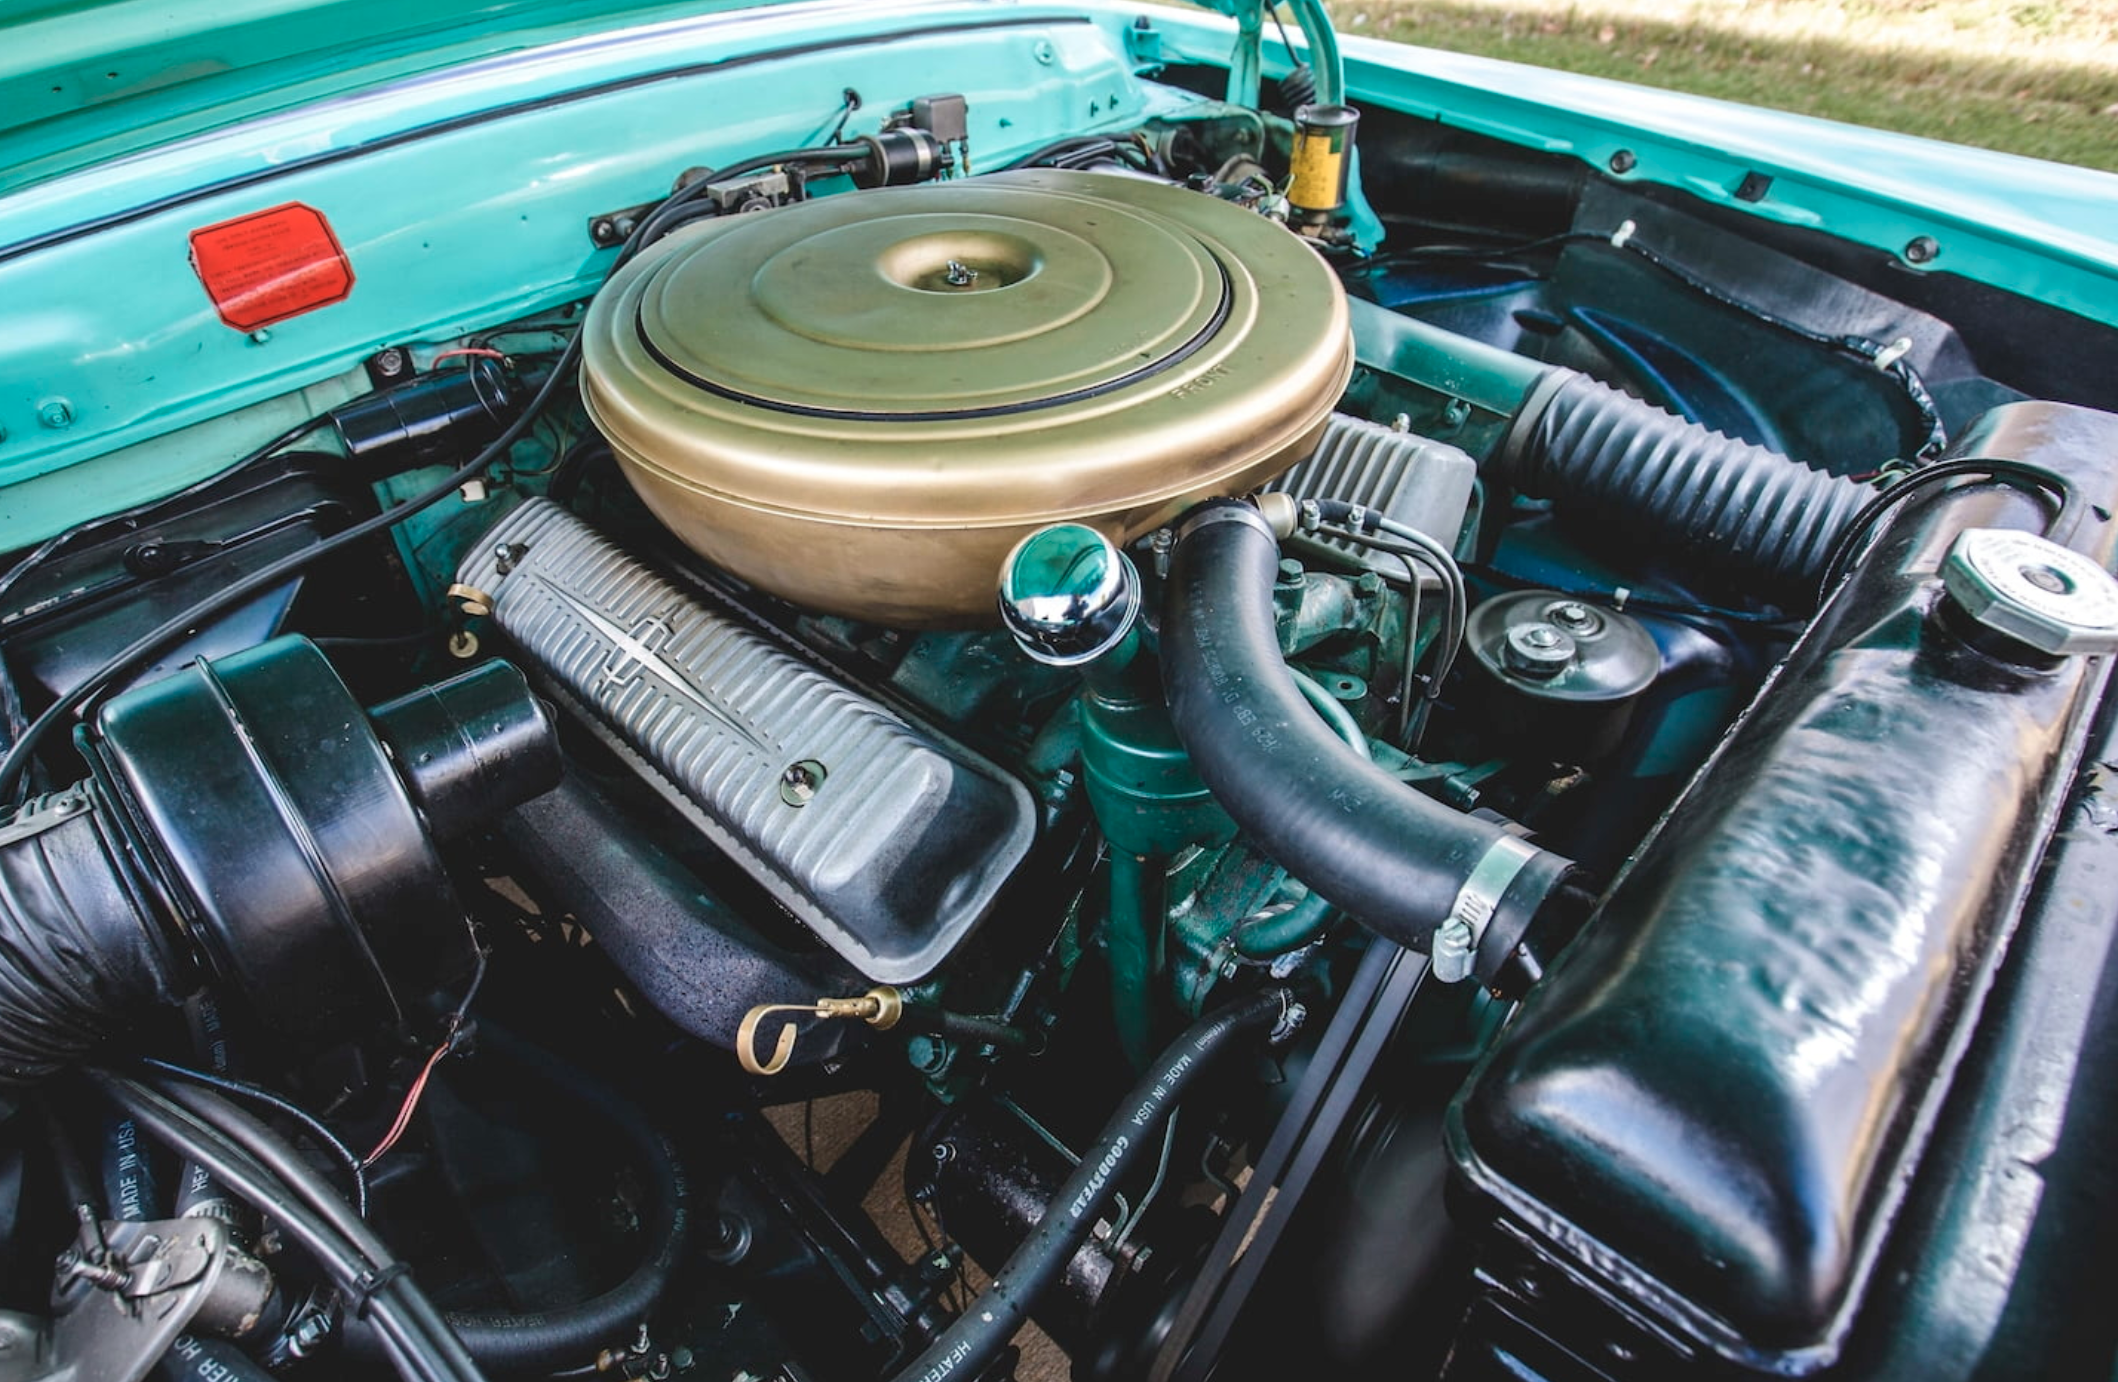 1957 Lincoln Engine Bay Y-block V-8